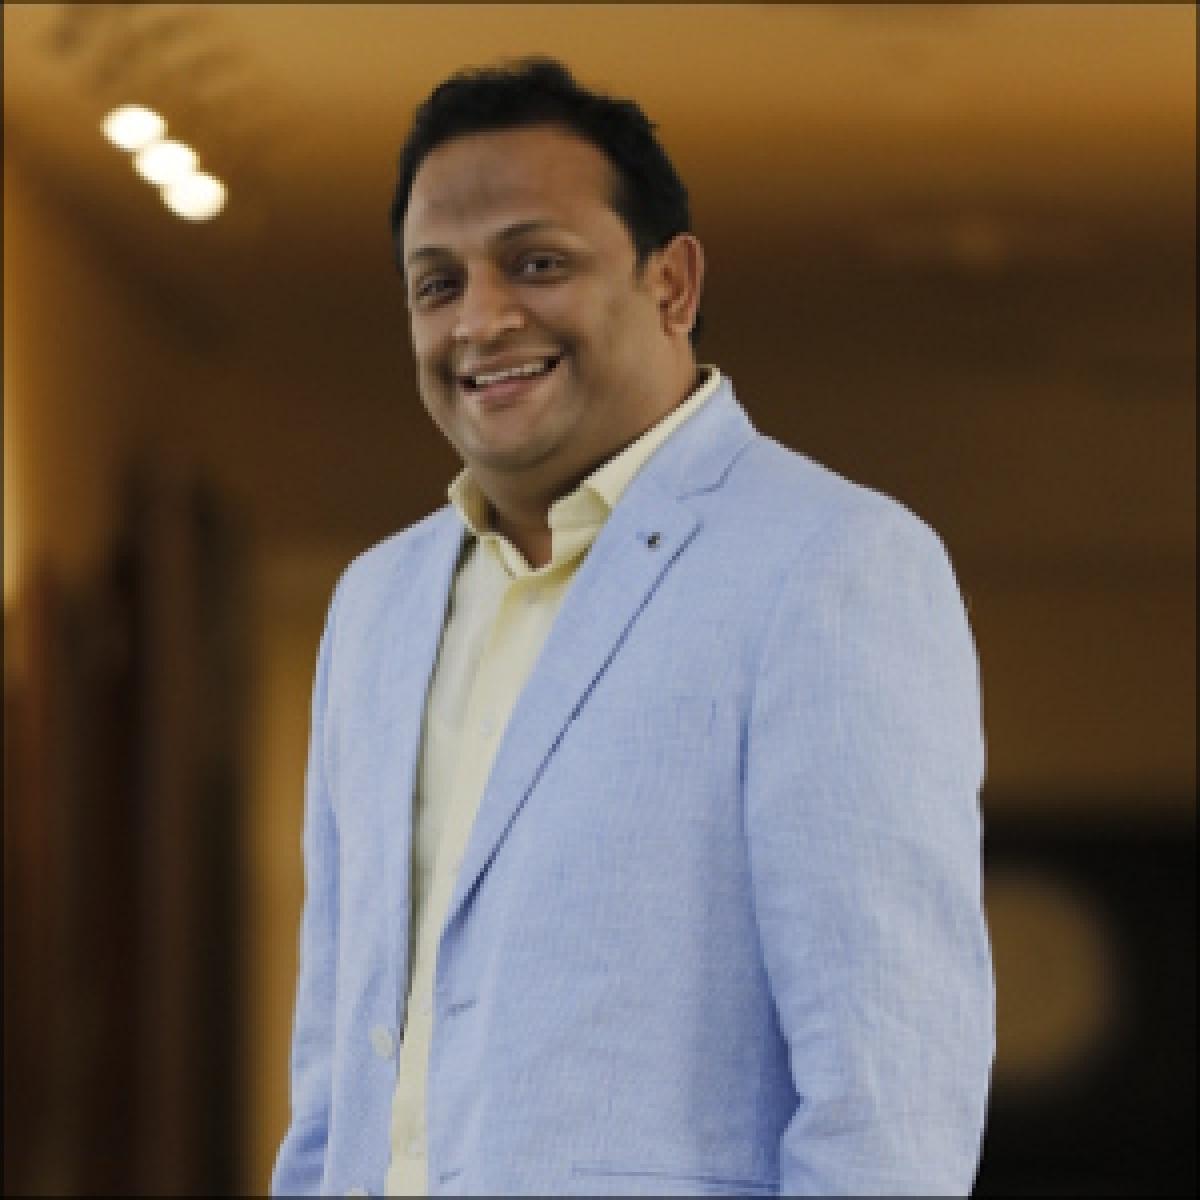 DAN appoints Kumar Deb Sinha as country head - The StoryLab